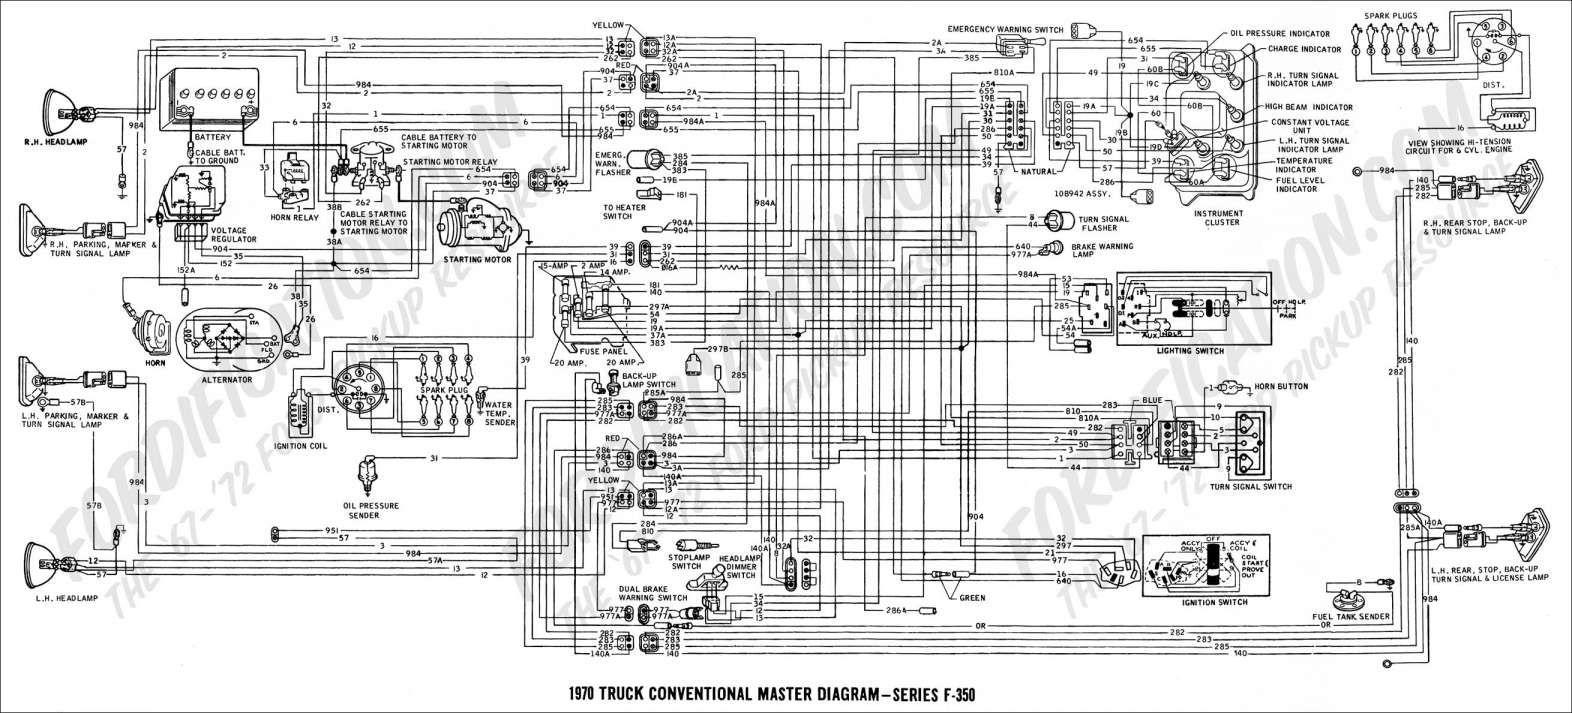 10 1993 Ford F250 Diesel Engine Performance Wiring Diagram Engine Diagram Wiringg Net In 2020 Powerstroke Ford F350 Ford F250